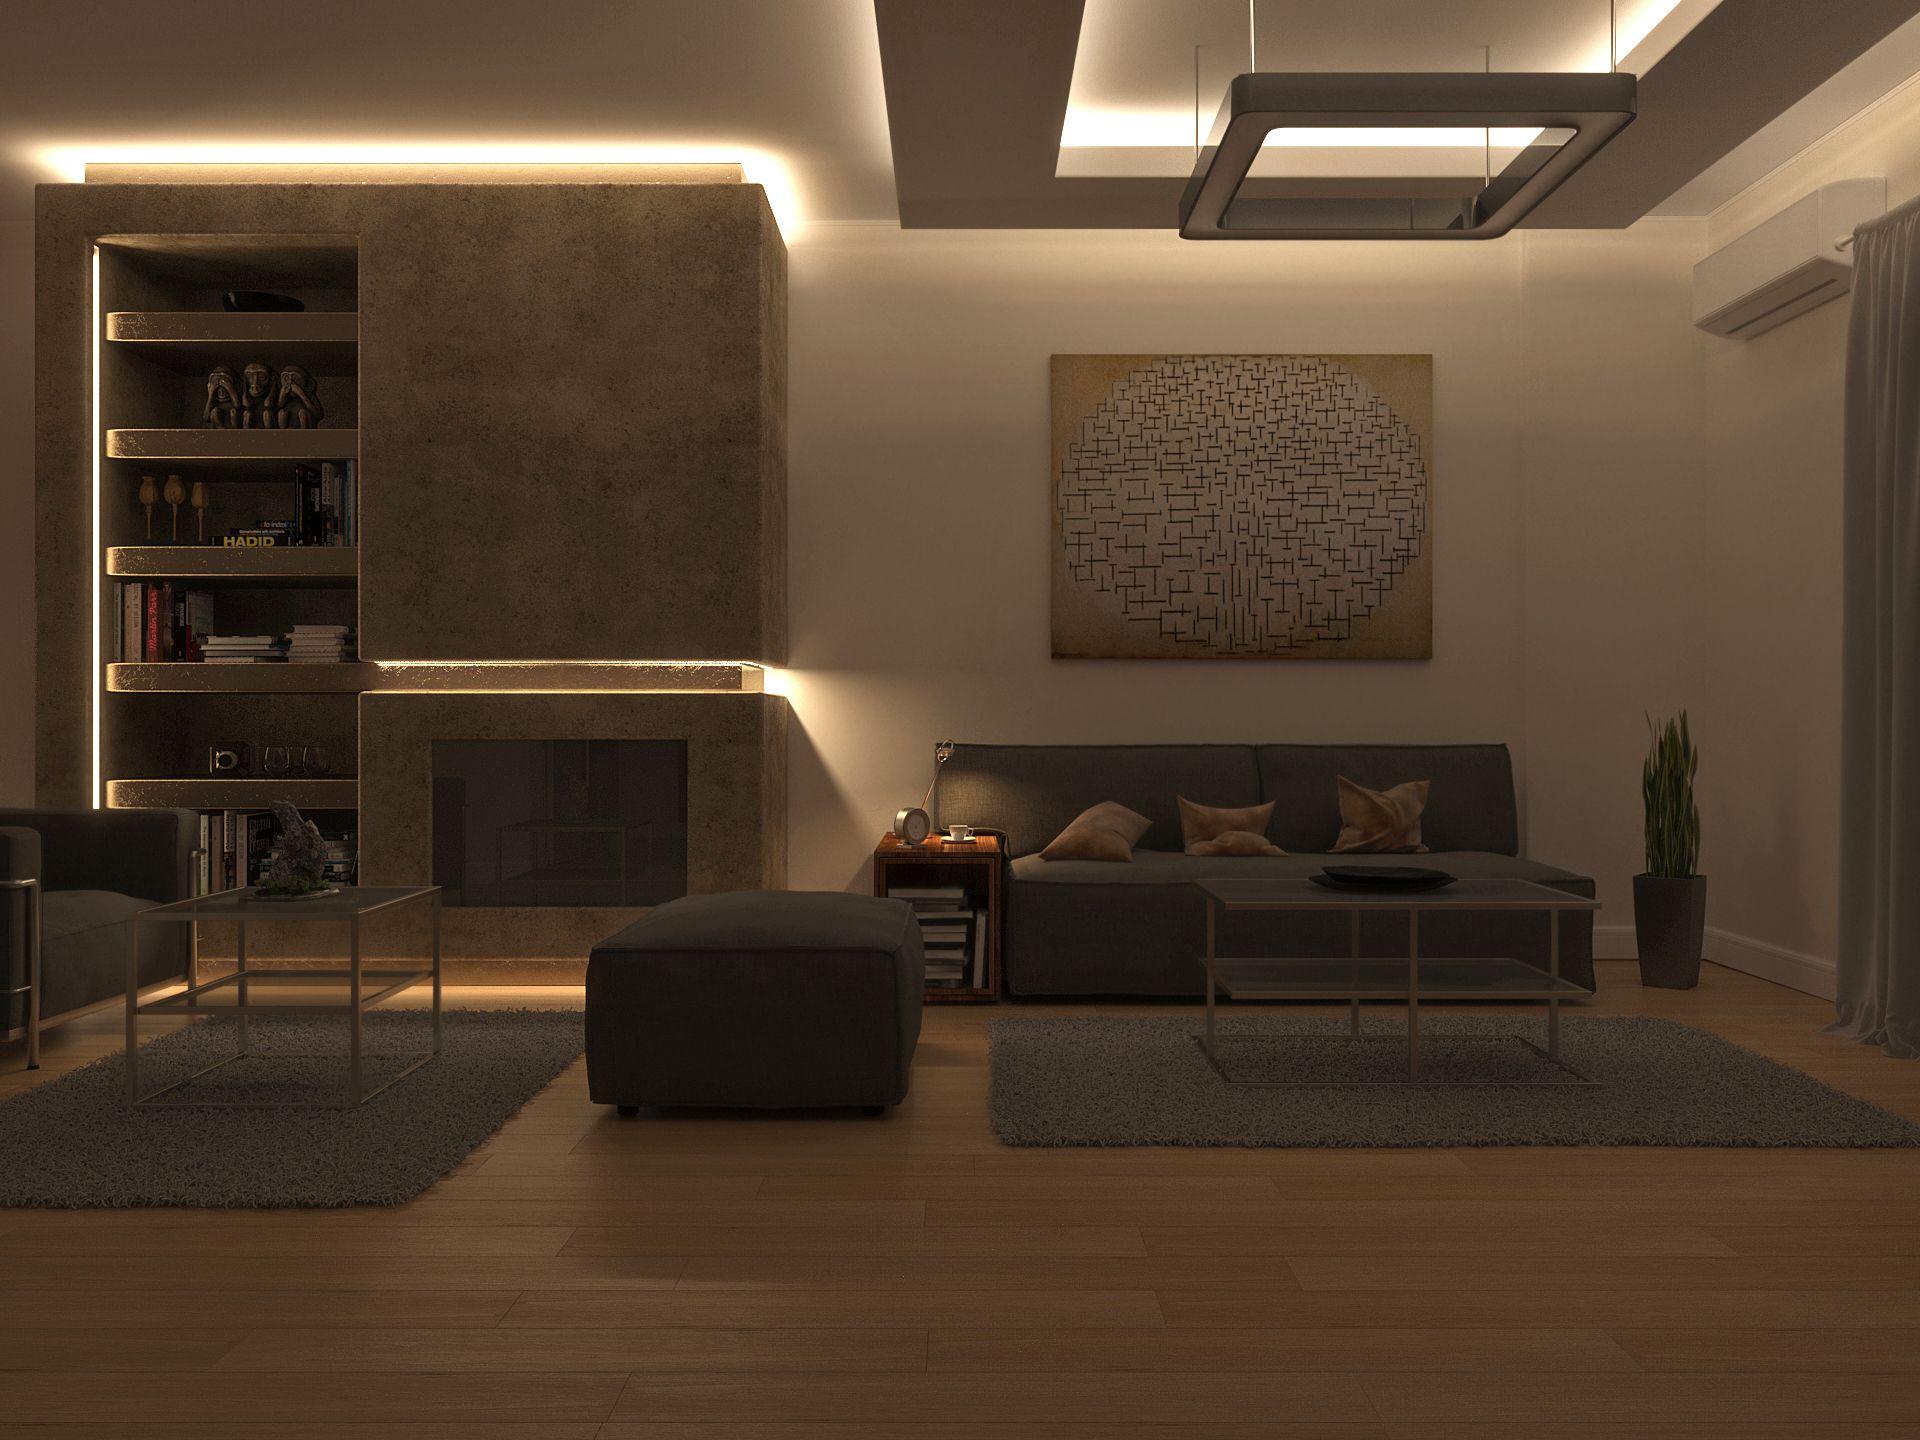 Flat renovation in faliro athens greece livingroom renovation modern lavaplaster oakfloor woodenfloor hiddenlights lightdesign furnituredesign